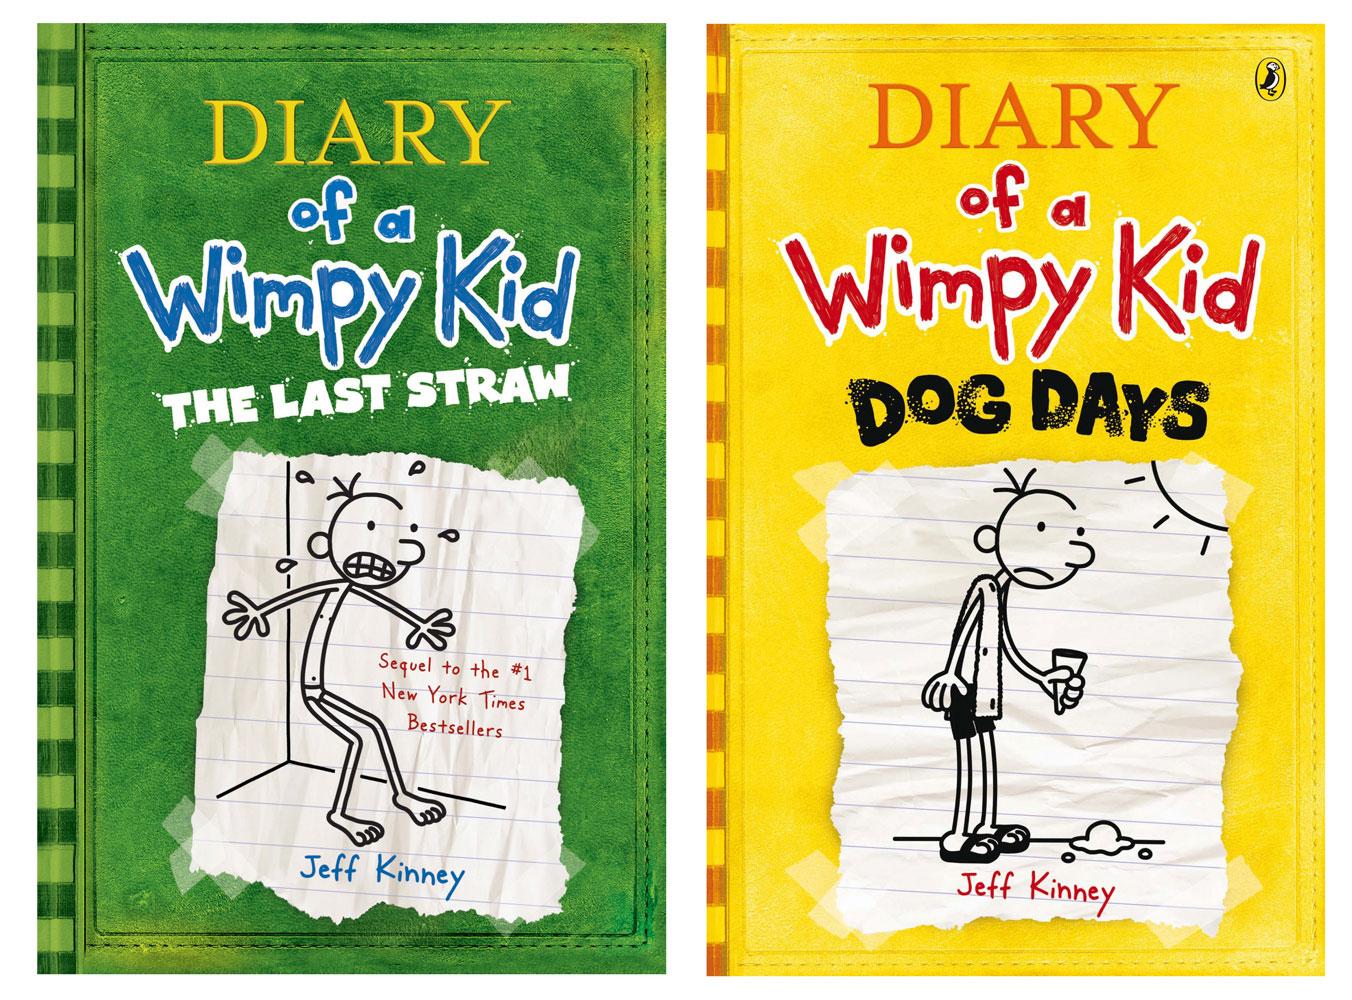 diary of a wimpy kid book last straw pdf